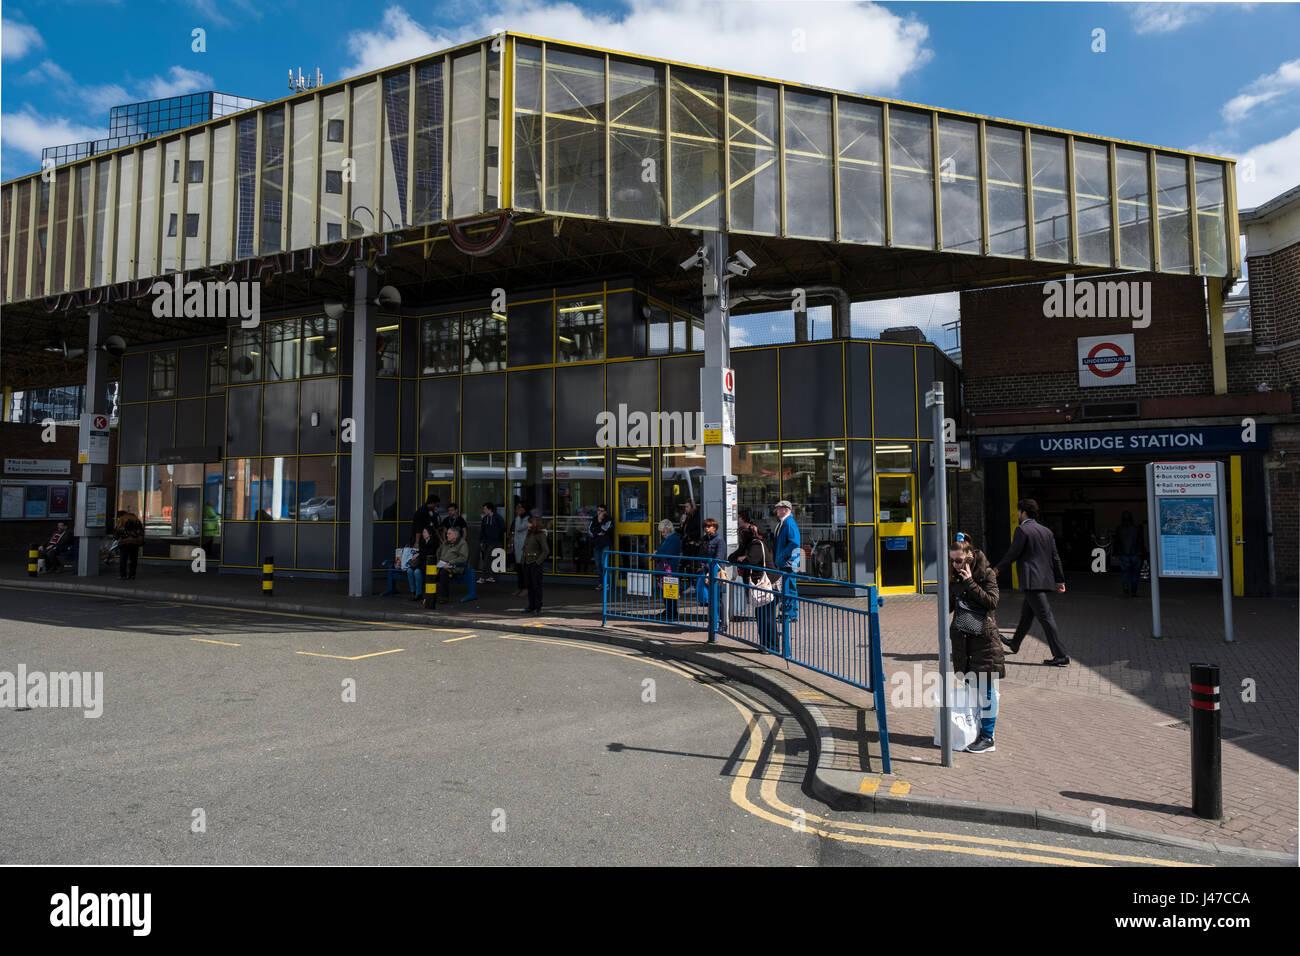 Uxbridge station Stock Photo